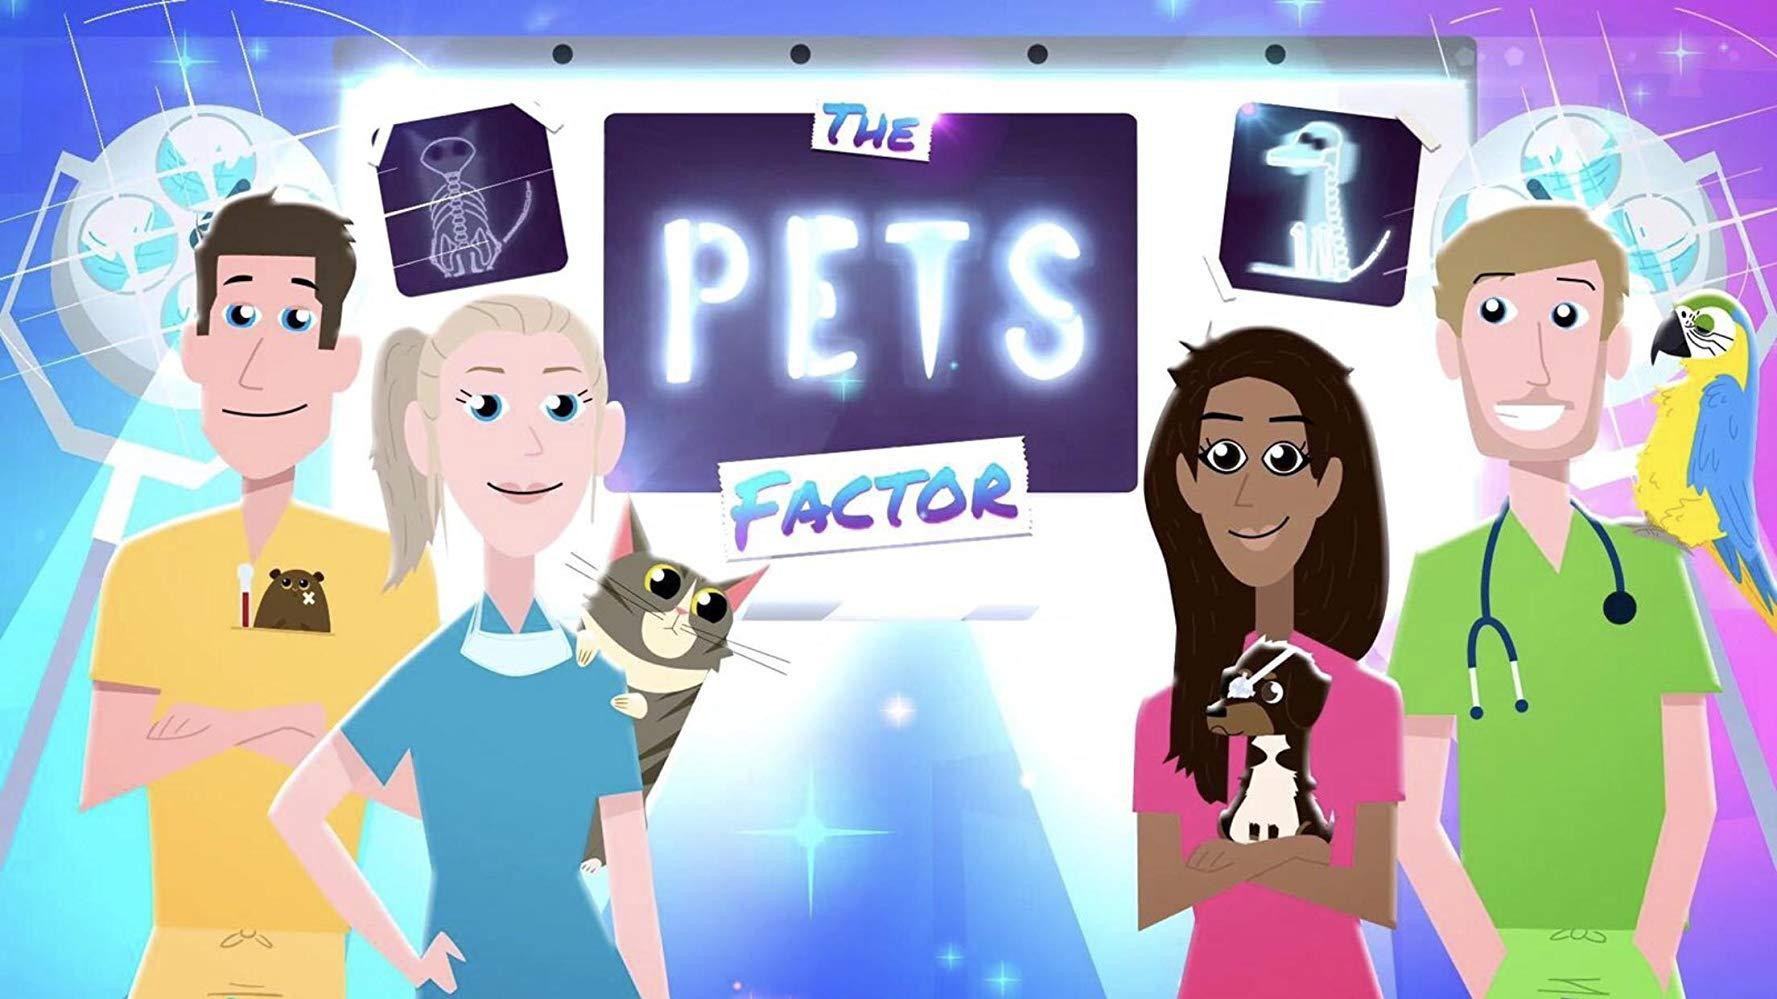 The Pets Factor S04E10 INTERNAL 720p WEB h264-WEBTUBE